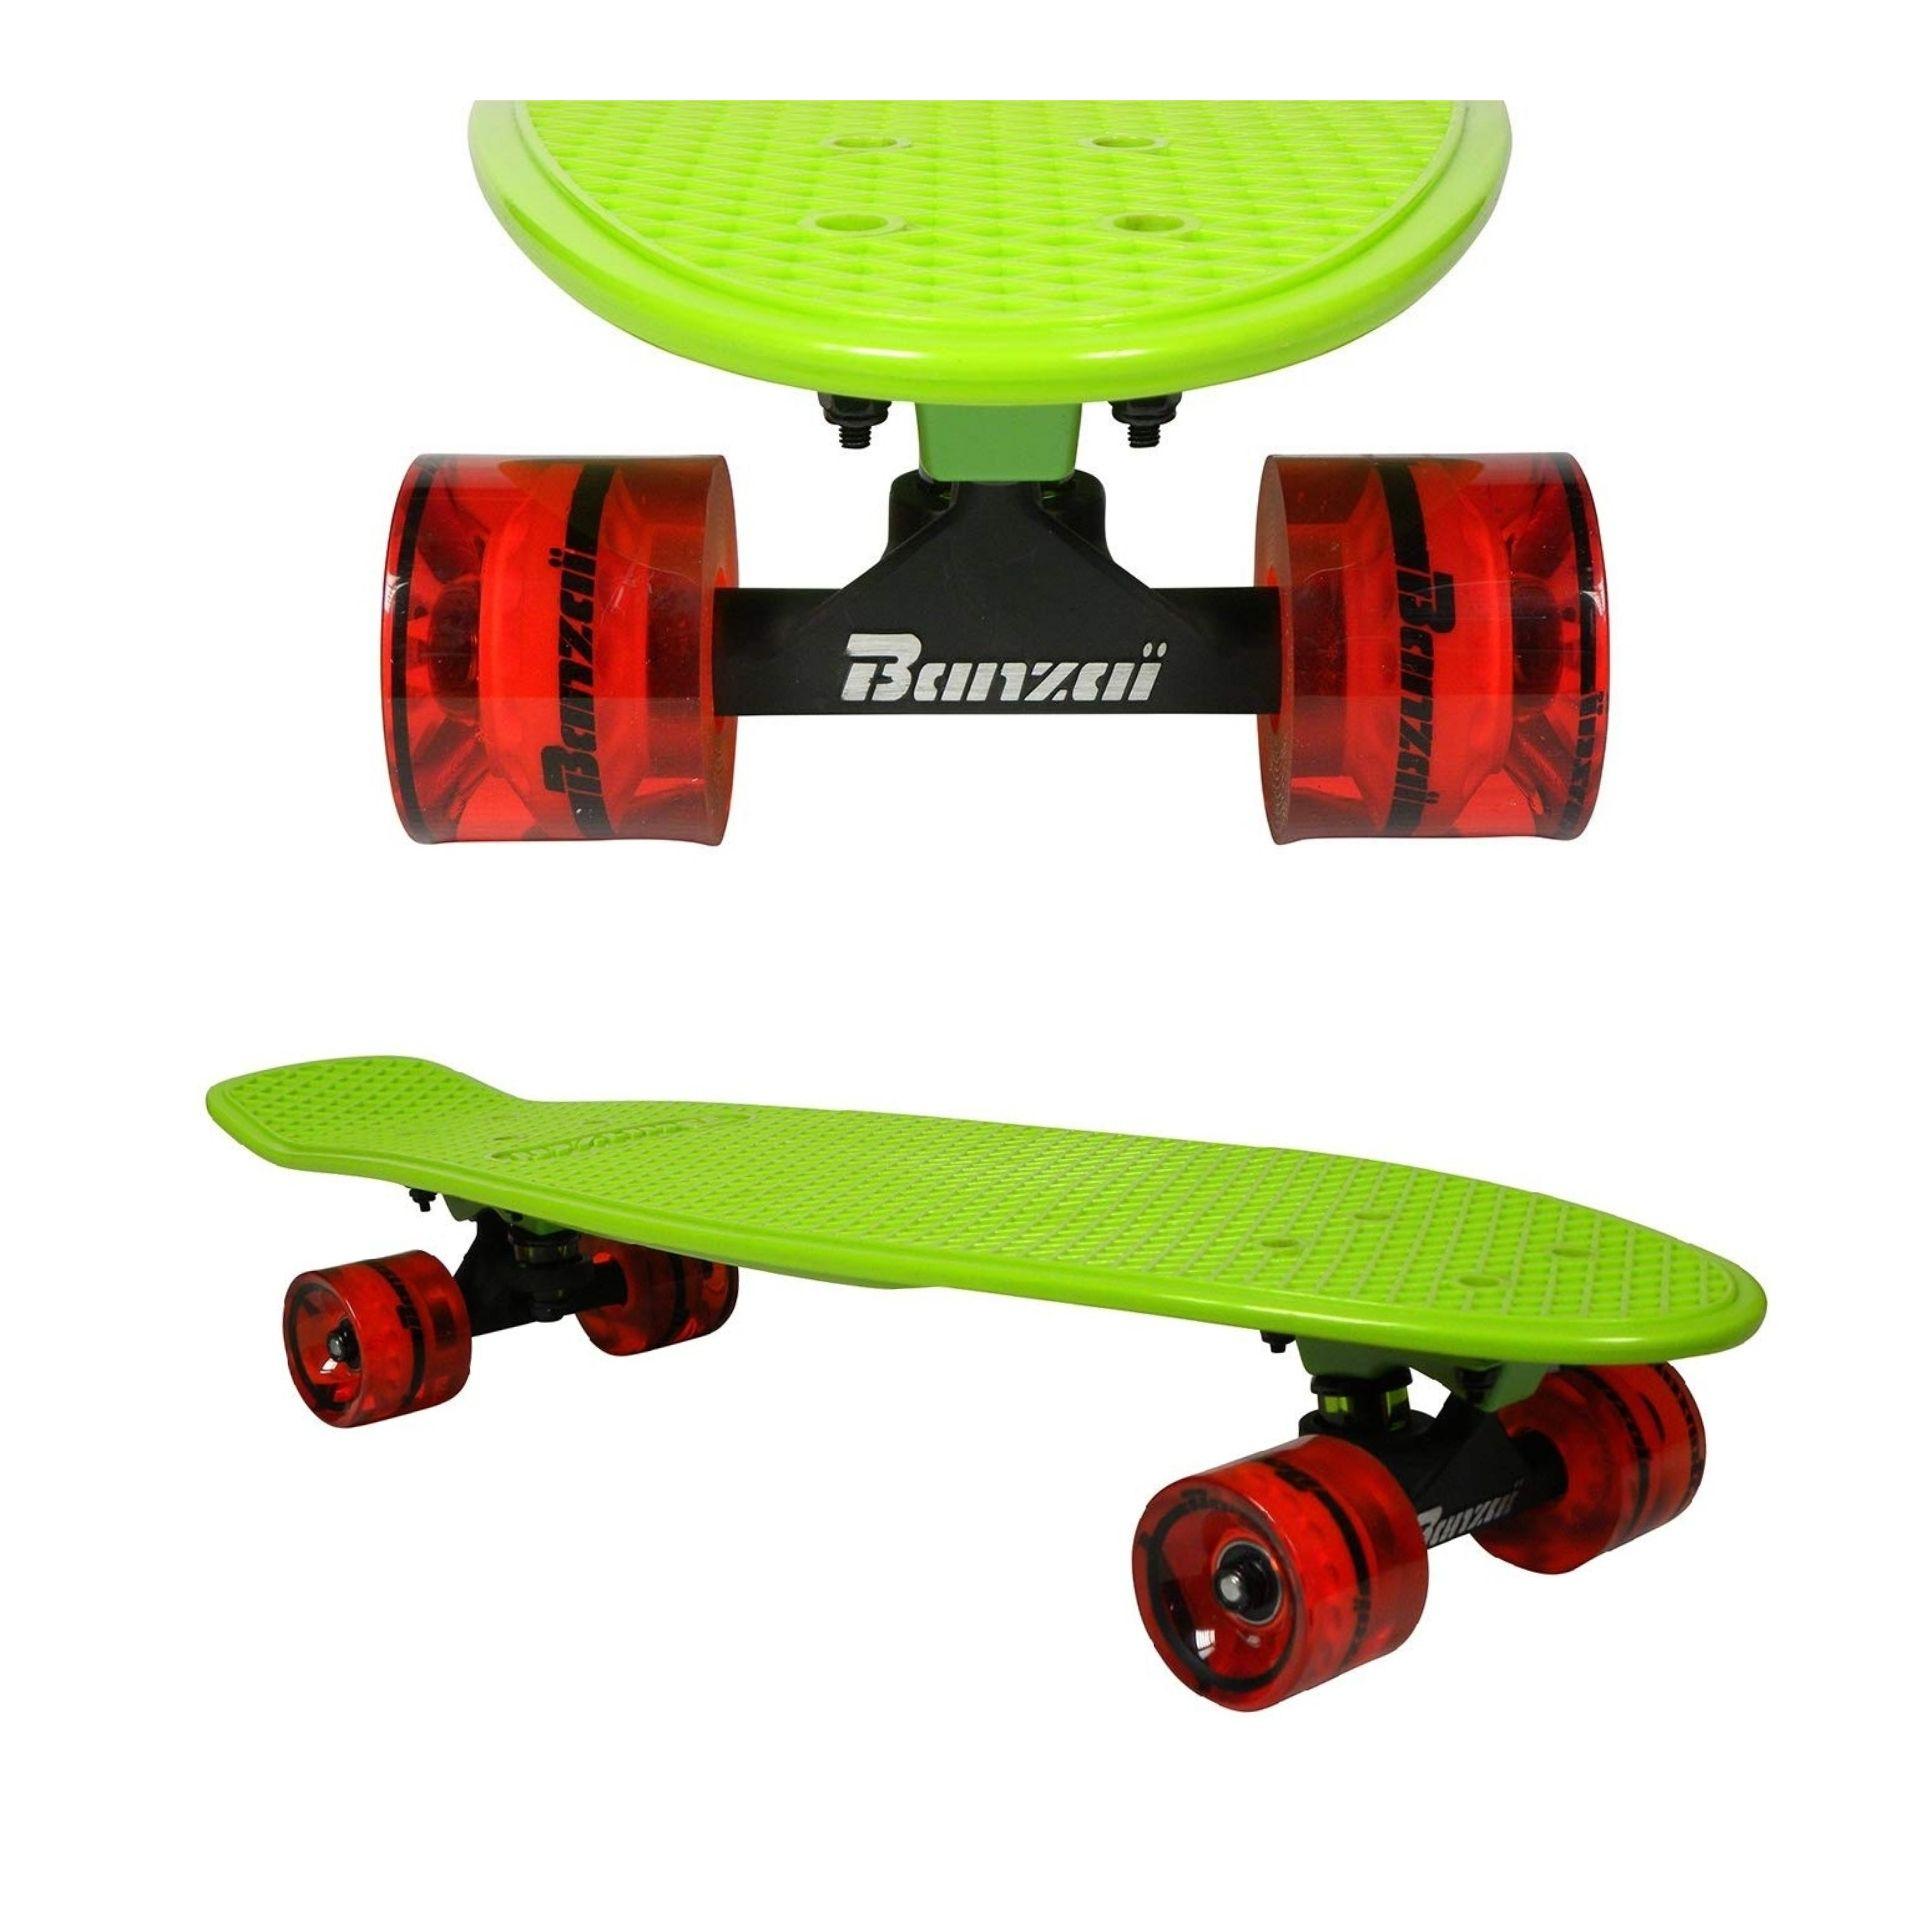 BANZAI Skateboard Vintage 22,5'' Verde/Naranja